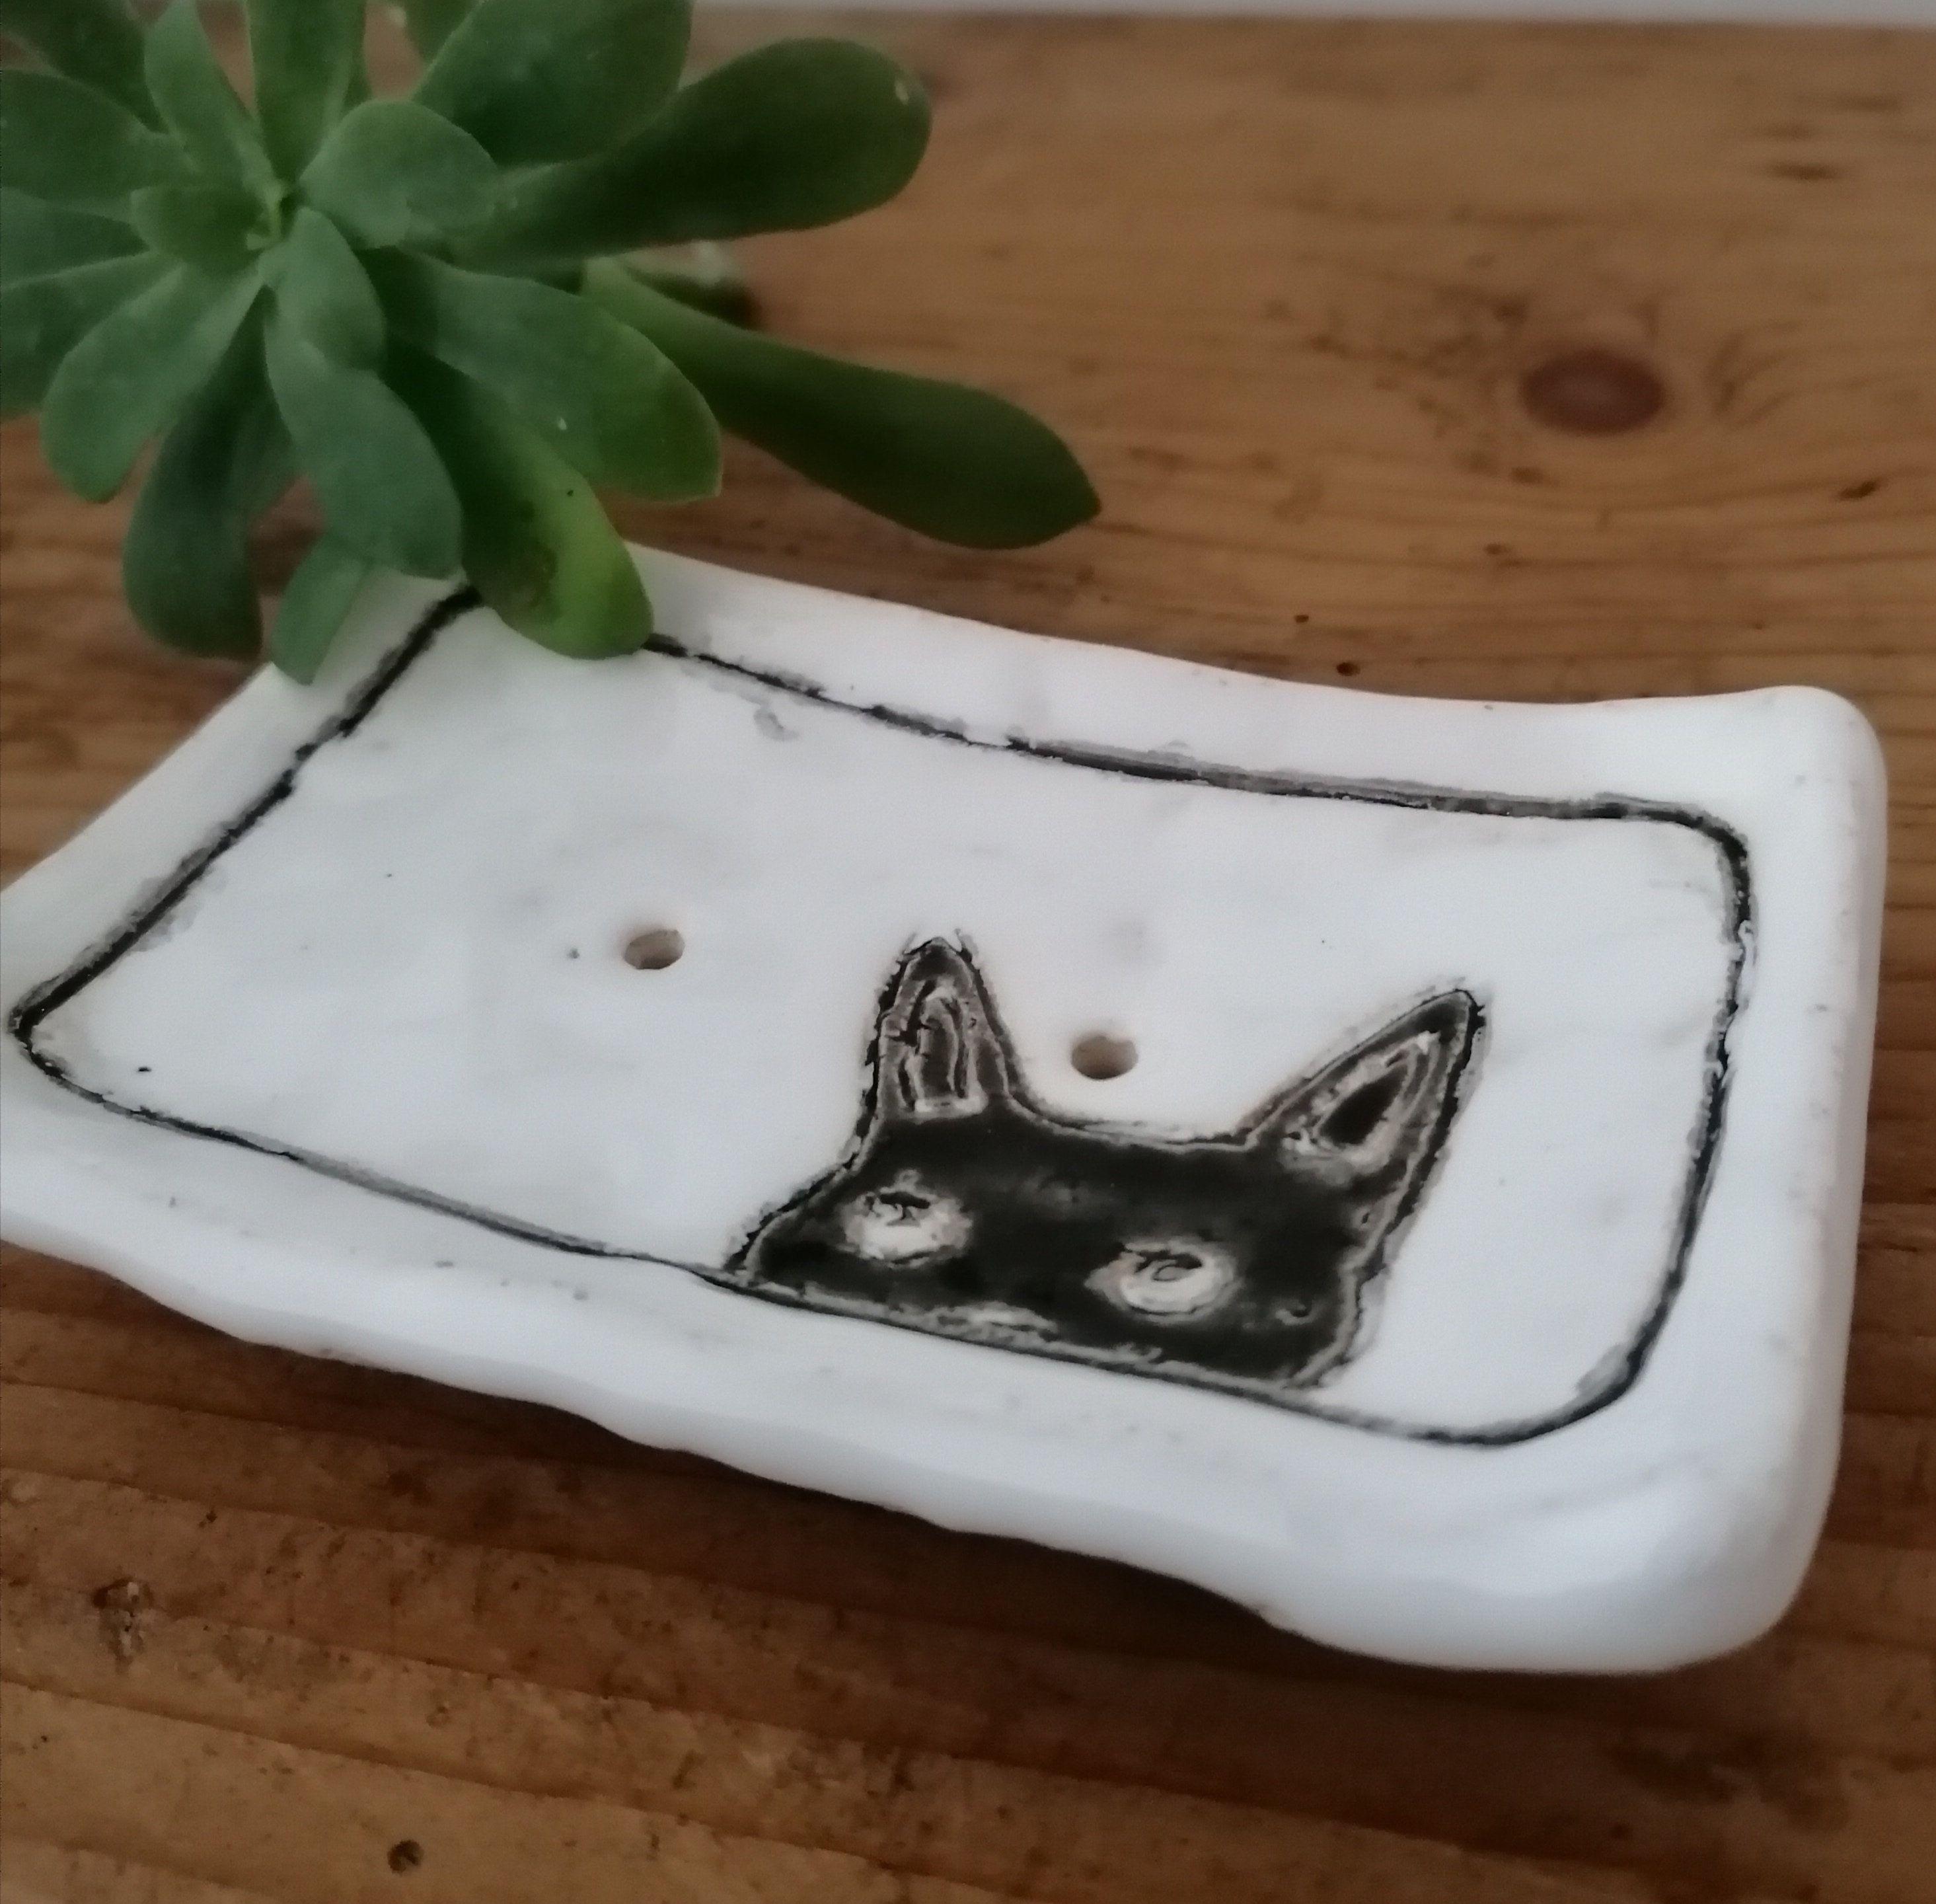 Seifenschale Schwarze Katze Keramik Badezimmer Seife Seifenablage